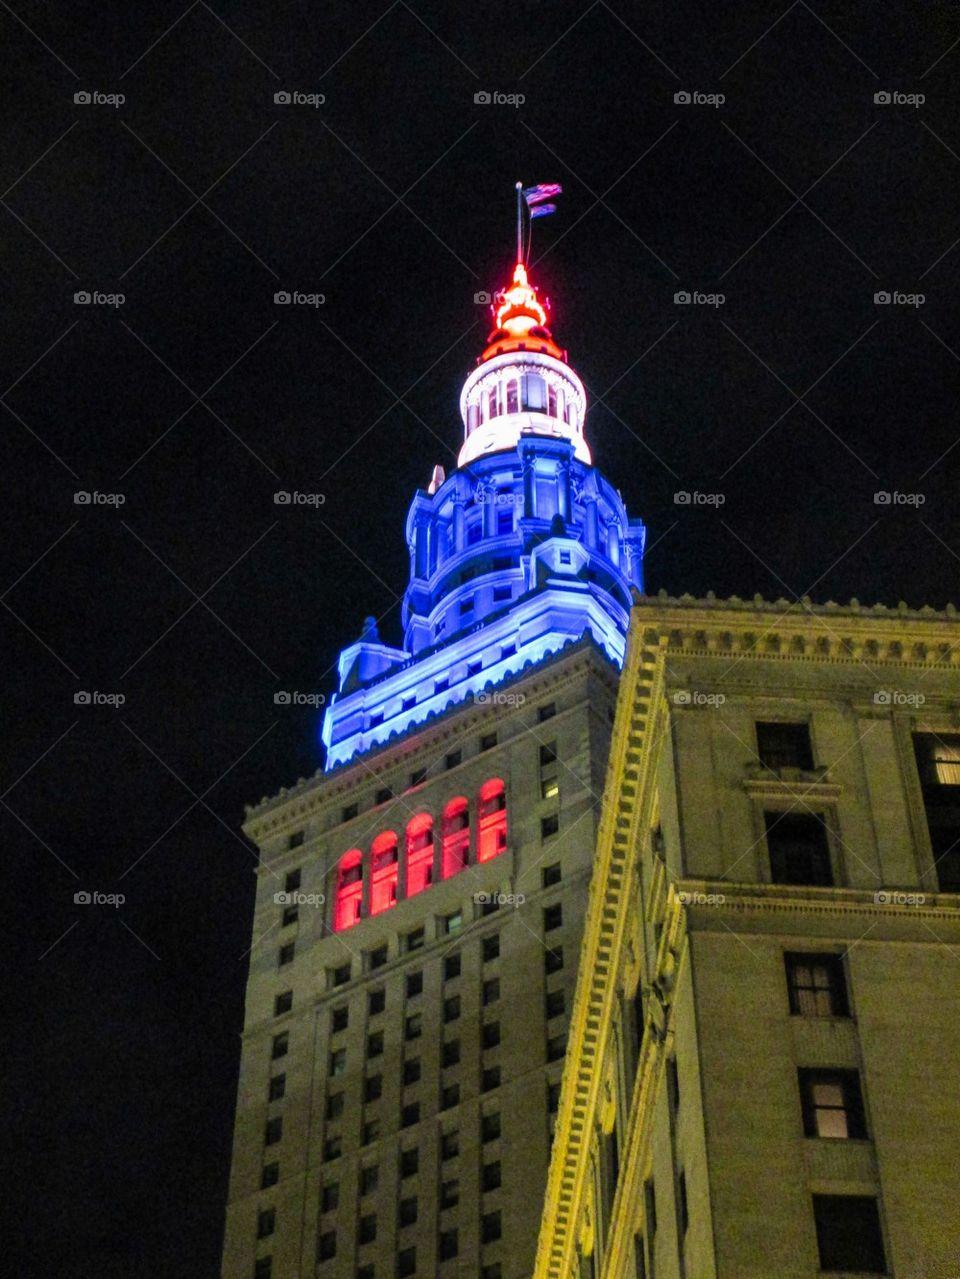 Terminal Tower lights